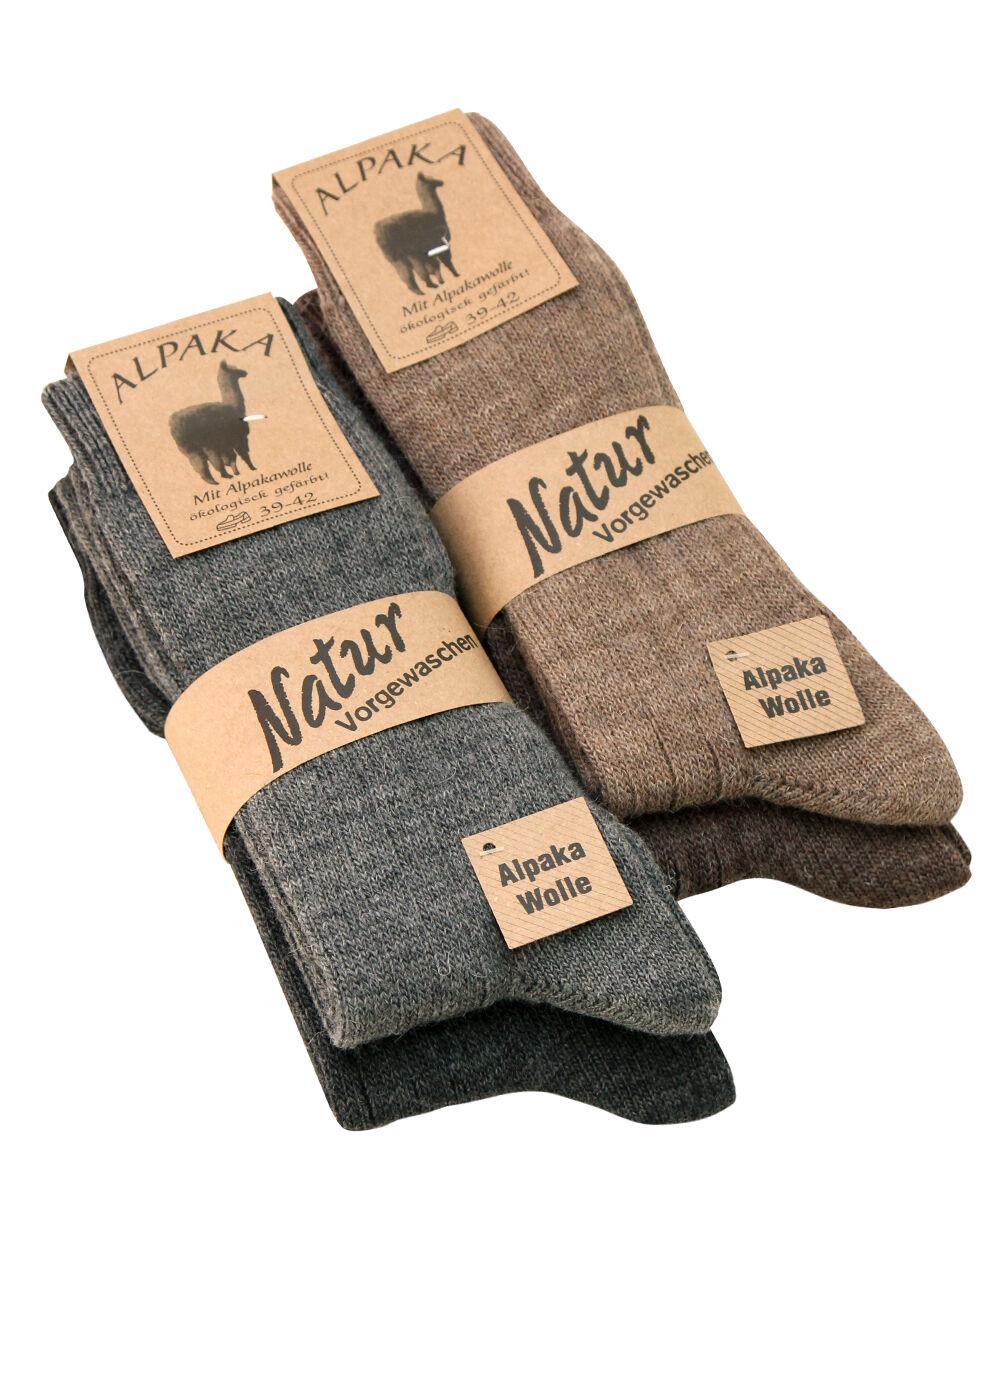 2-4 Paar Alpaka Socken Strümpfe Wollsocken warm dünn gestrickt für Damen Herren